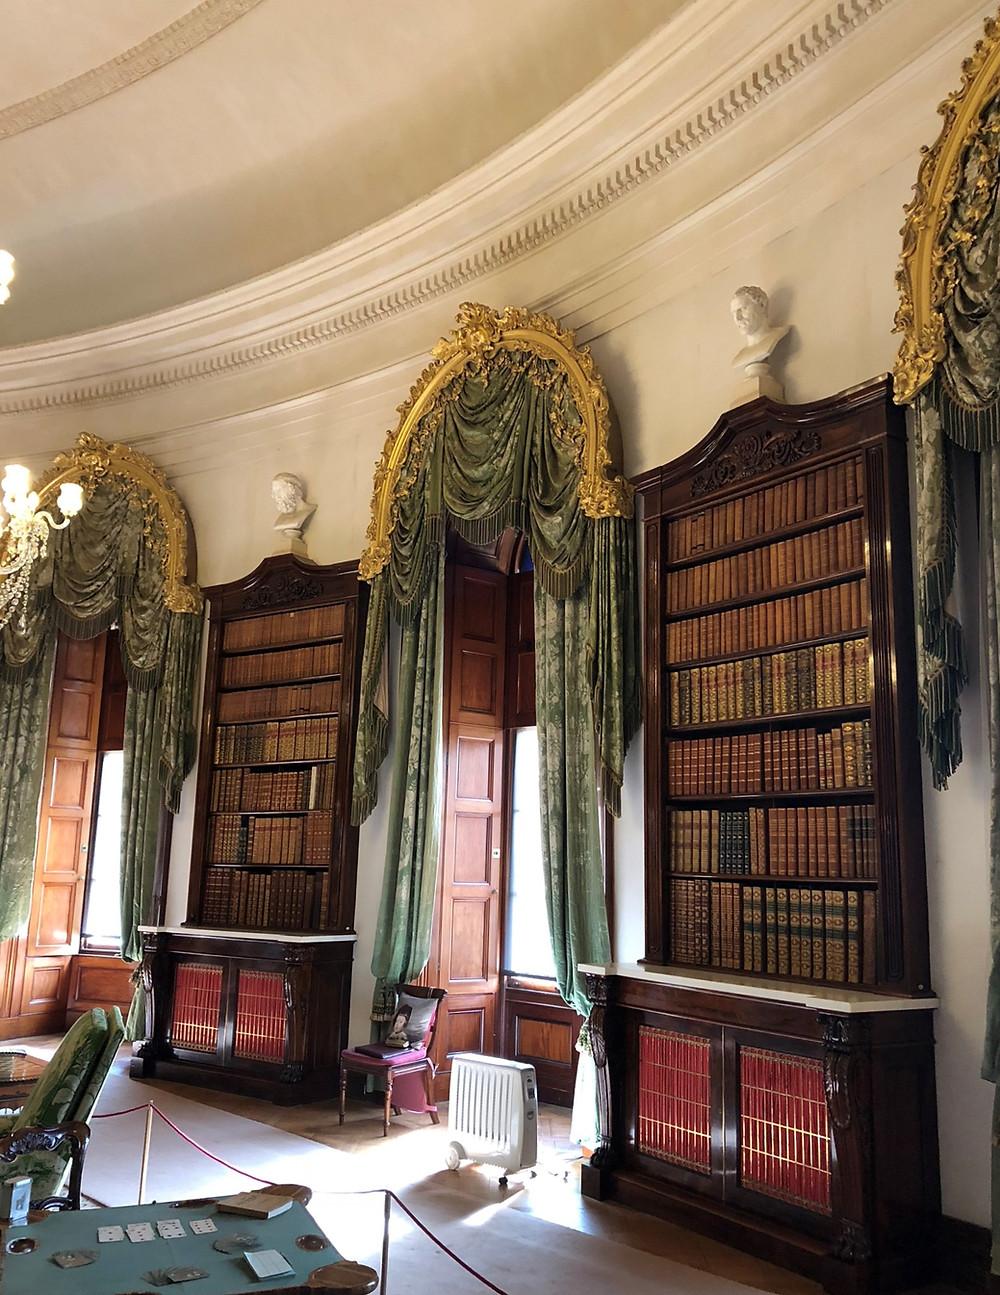 Regency library at Ickworth